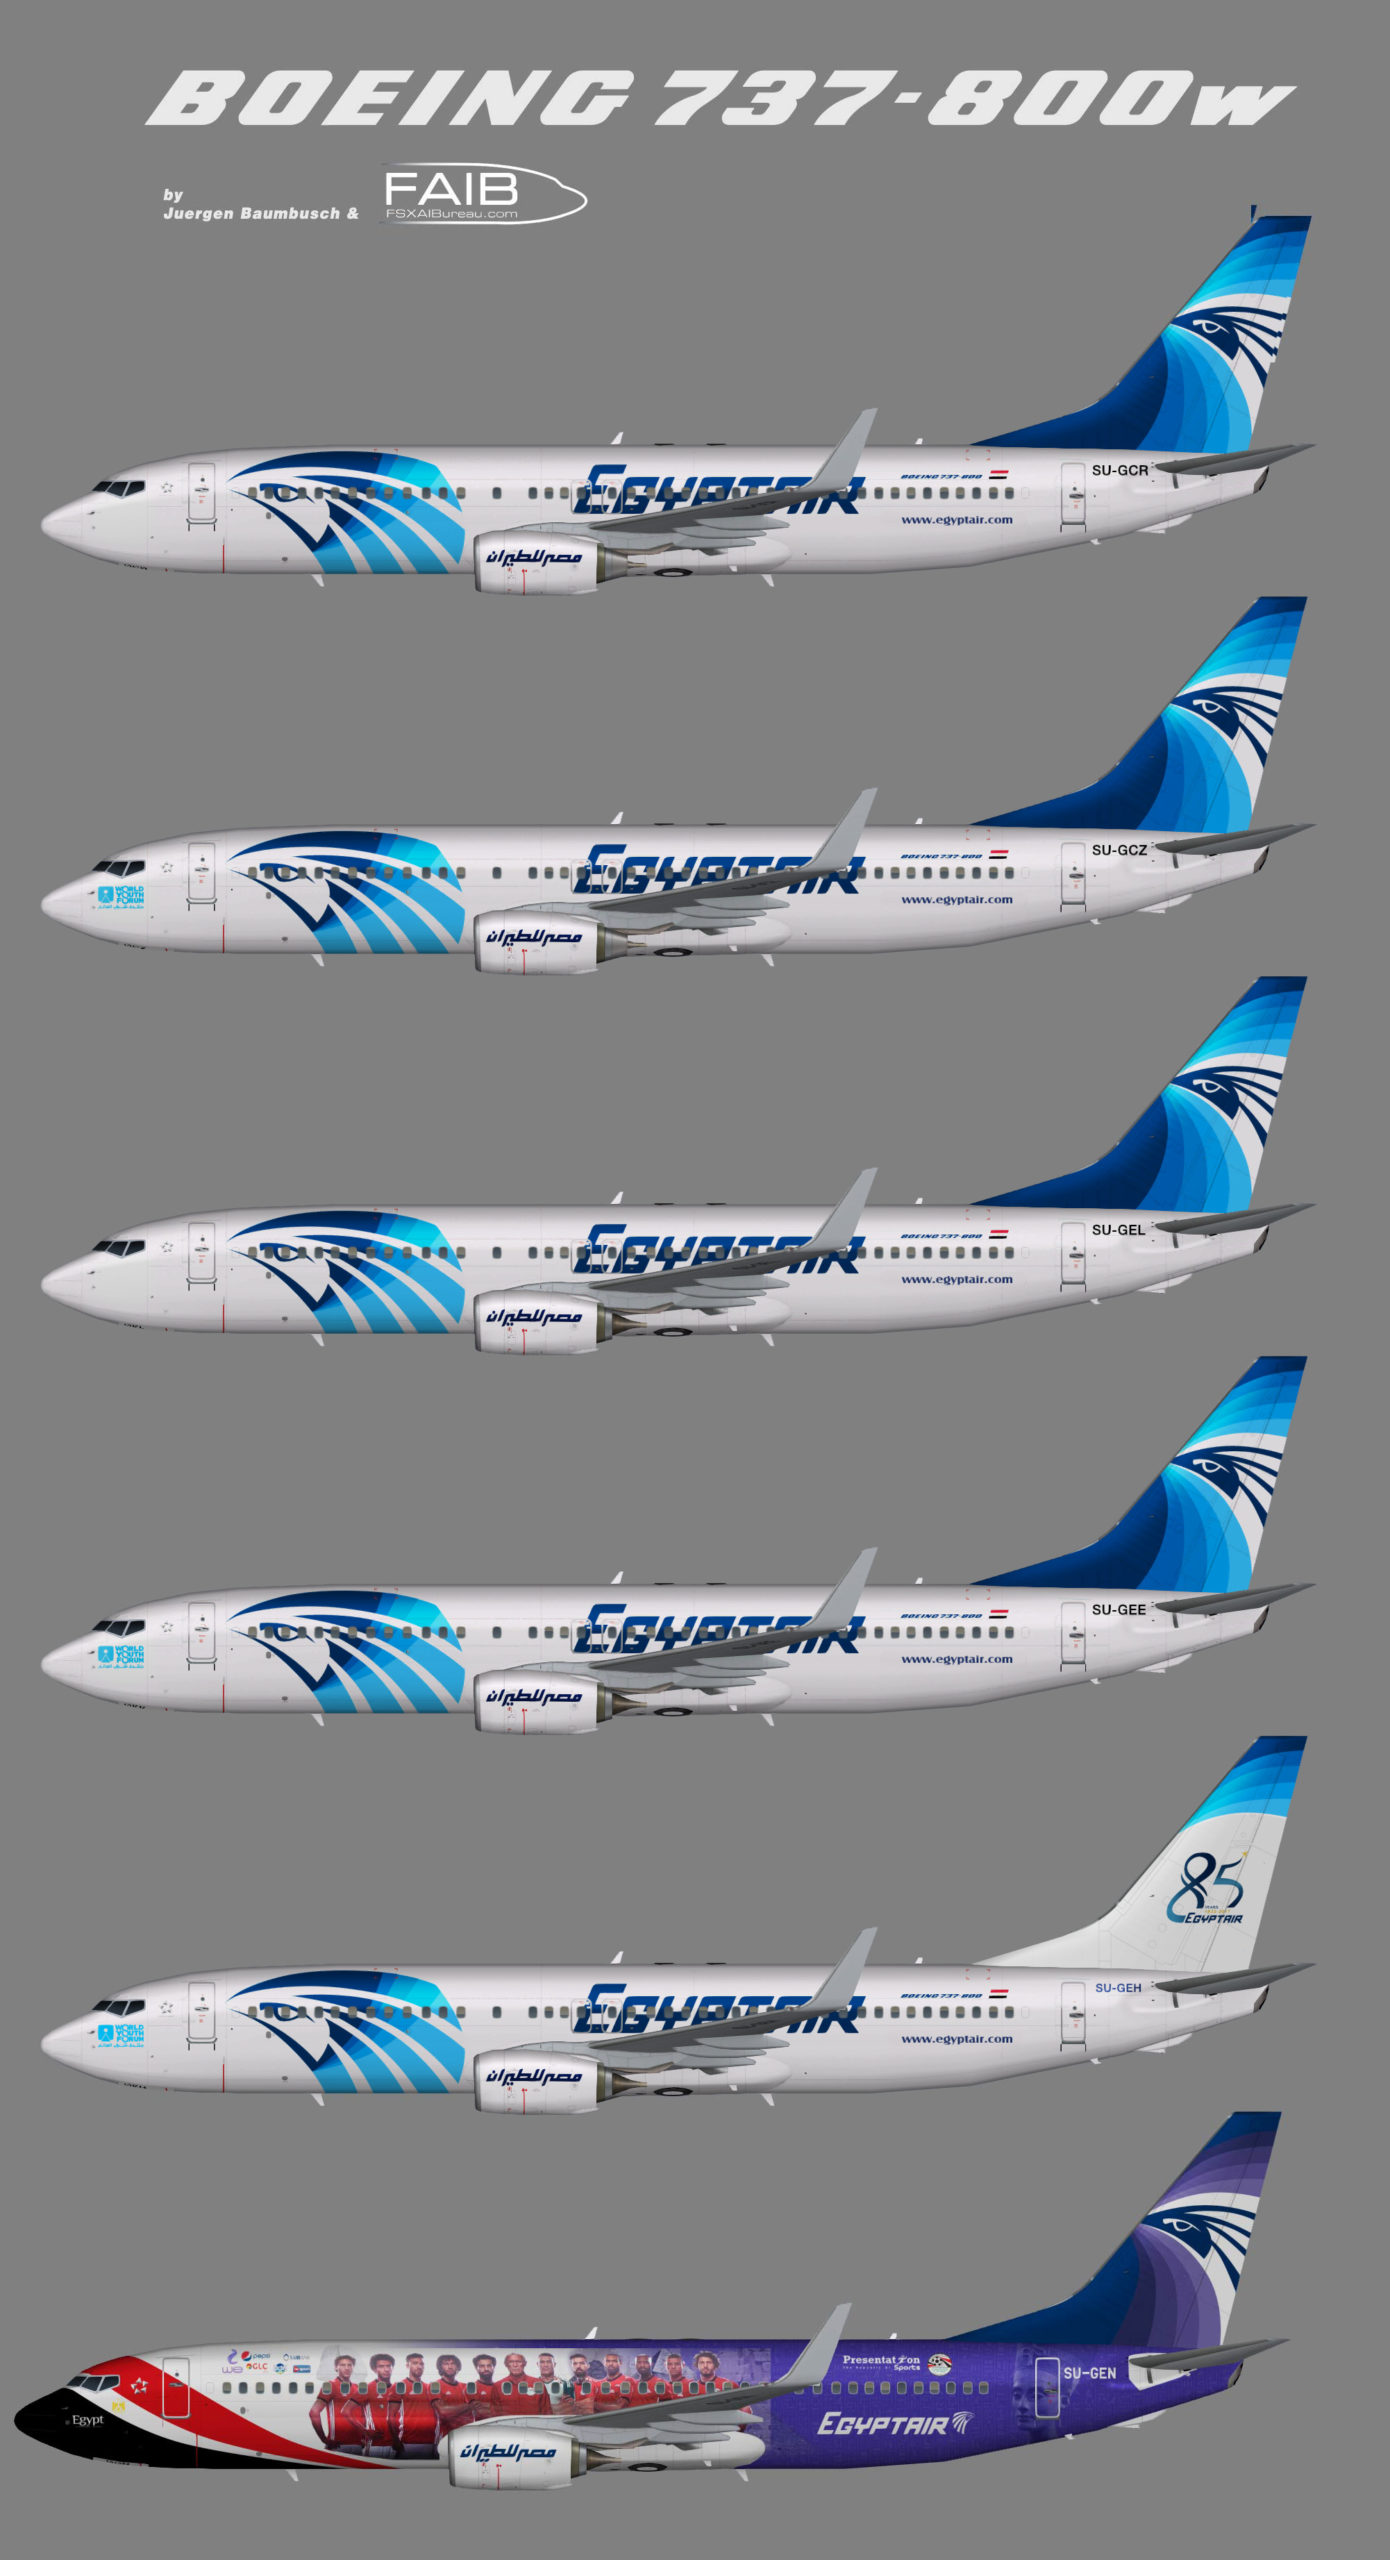 Egyptair NC Boeing 737-800w